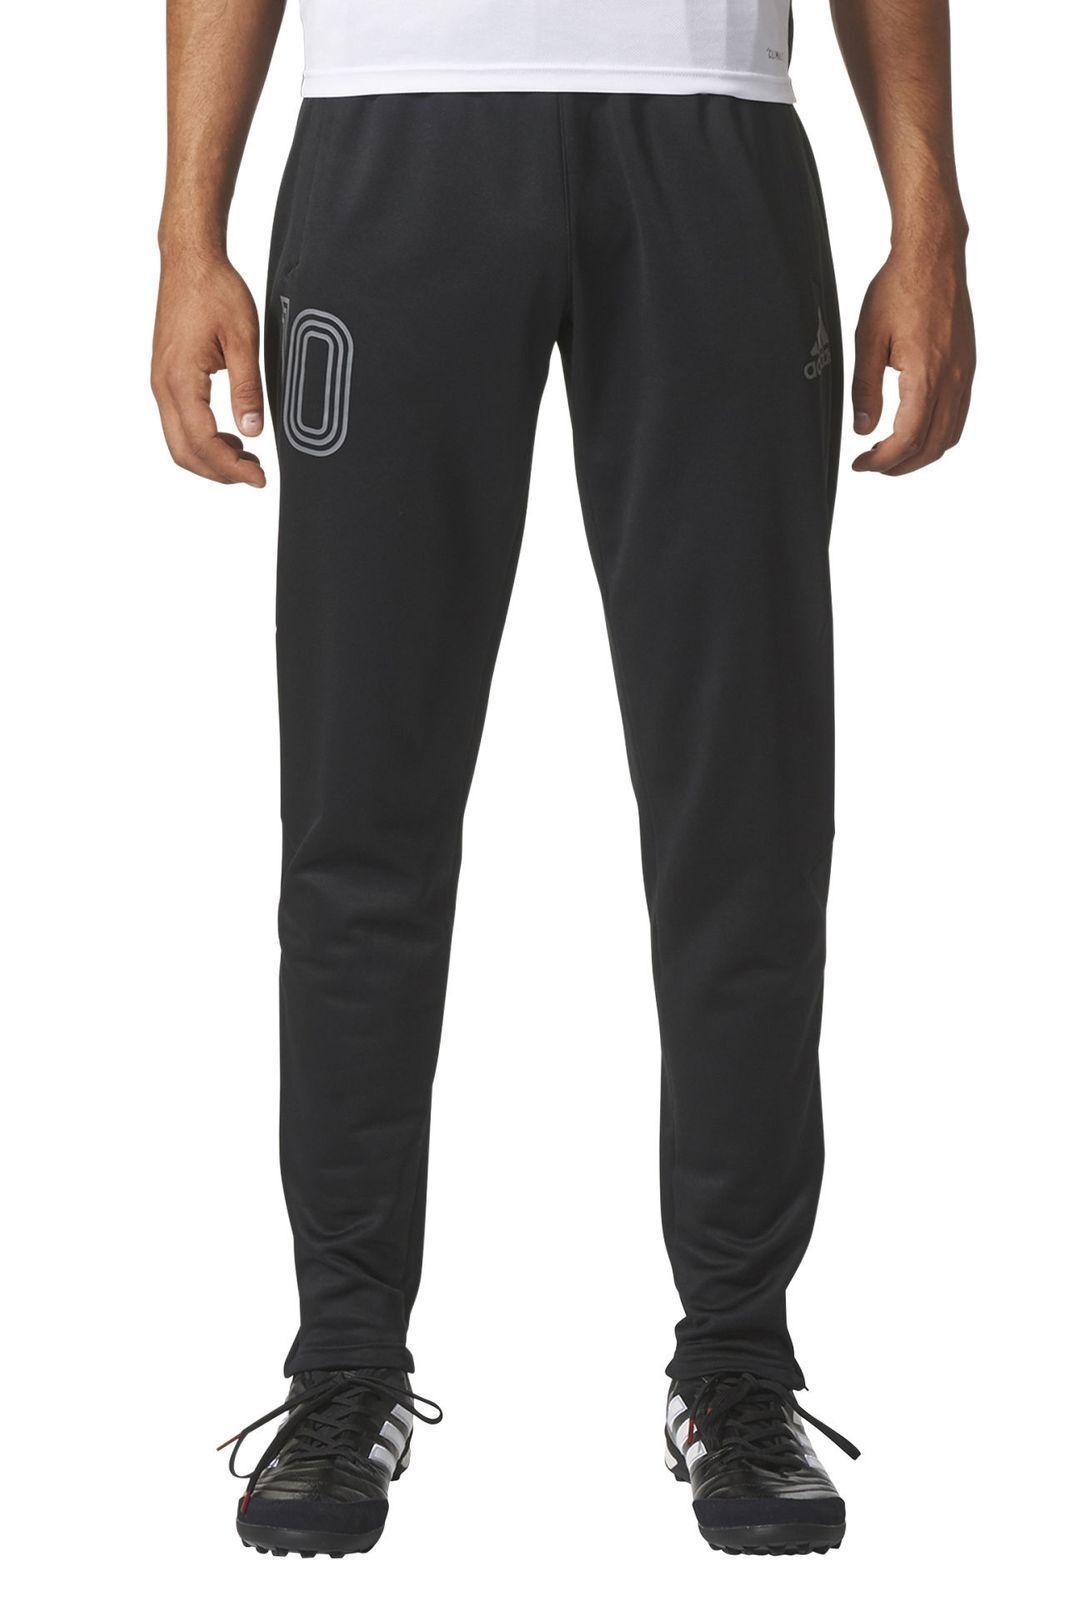 Adidas Performance Herren Herren Herren Fussball Trainingshose TANIP TRAINING PANT schwarz  | Einfach zu spielen, freies Leben  afb9cf